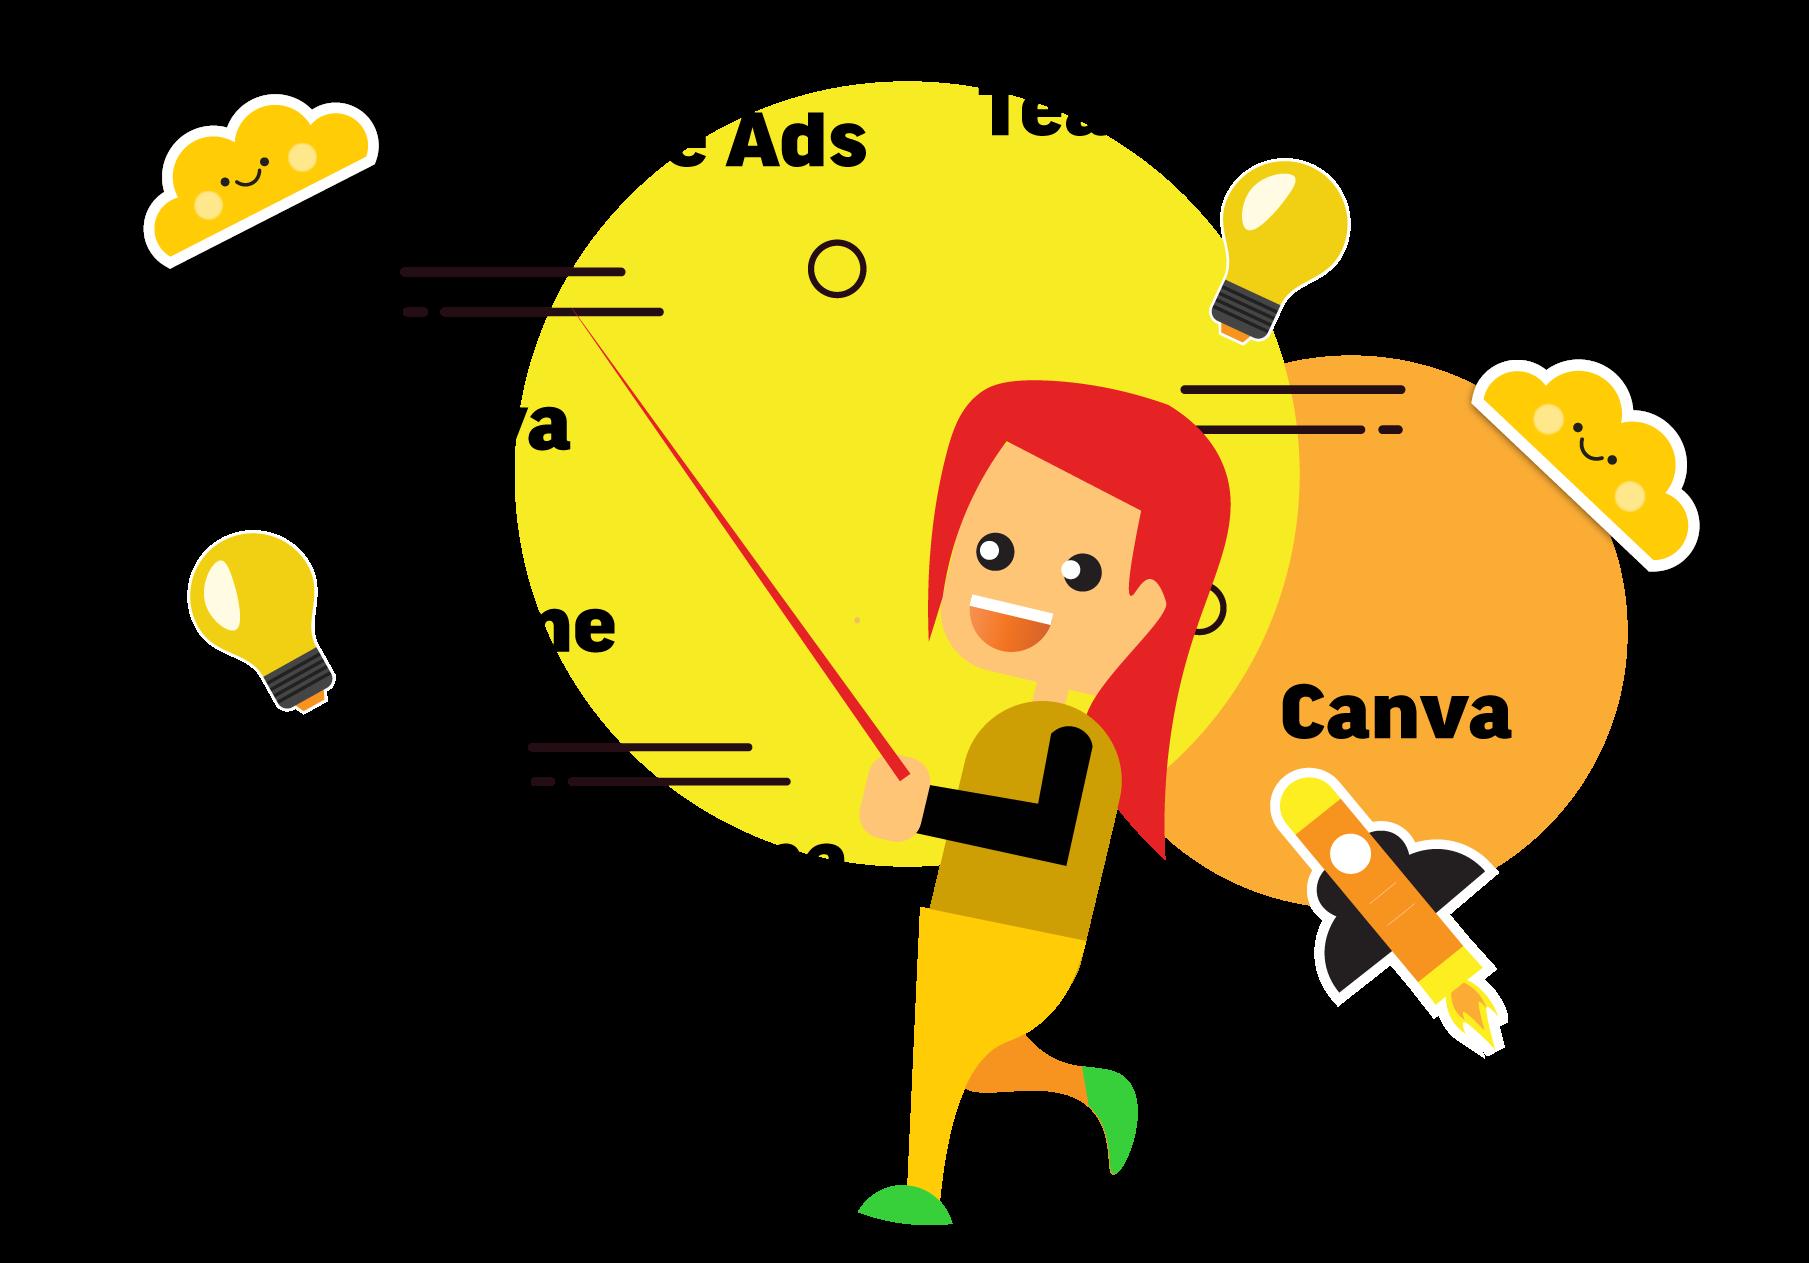 Google Ads, Teams, tietoturva, some, verkkokauppa, canva.